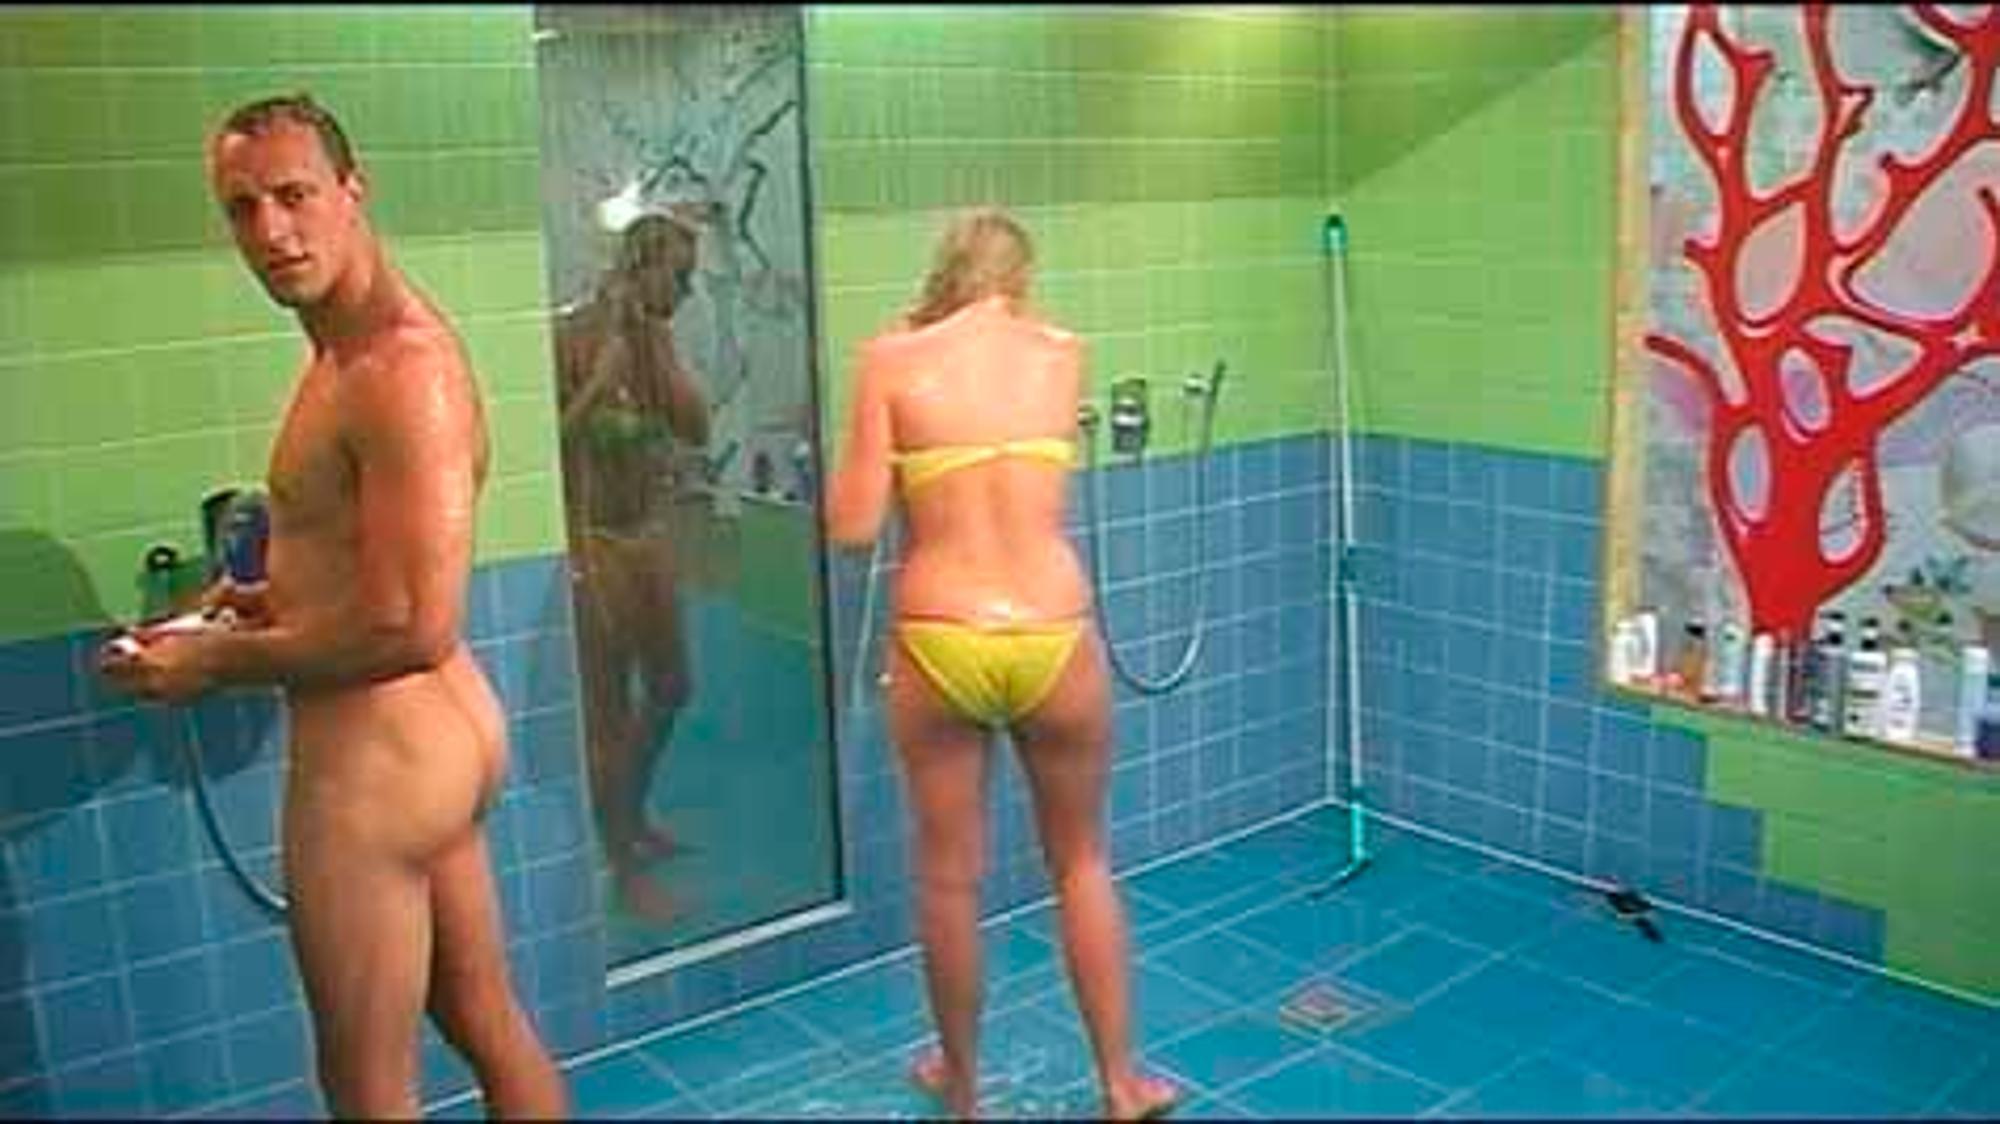 Dusche big nackt brother Jessica Paszka